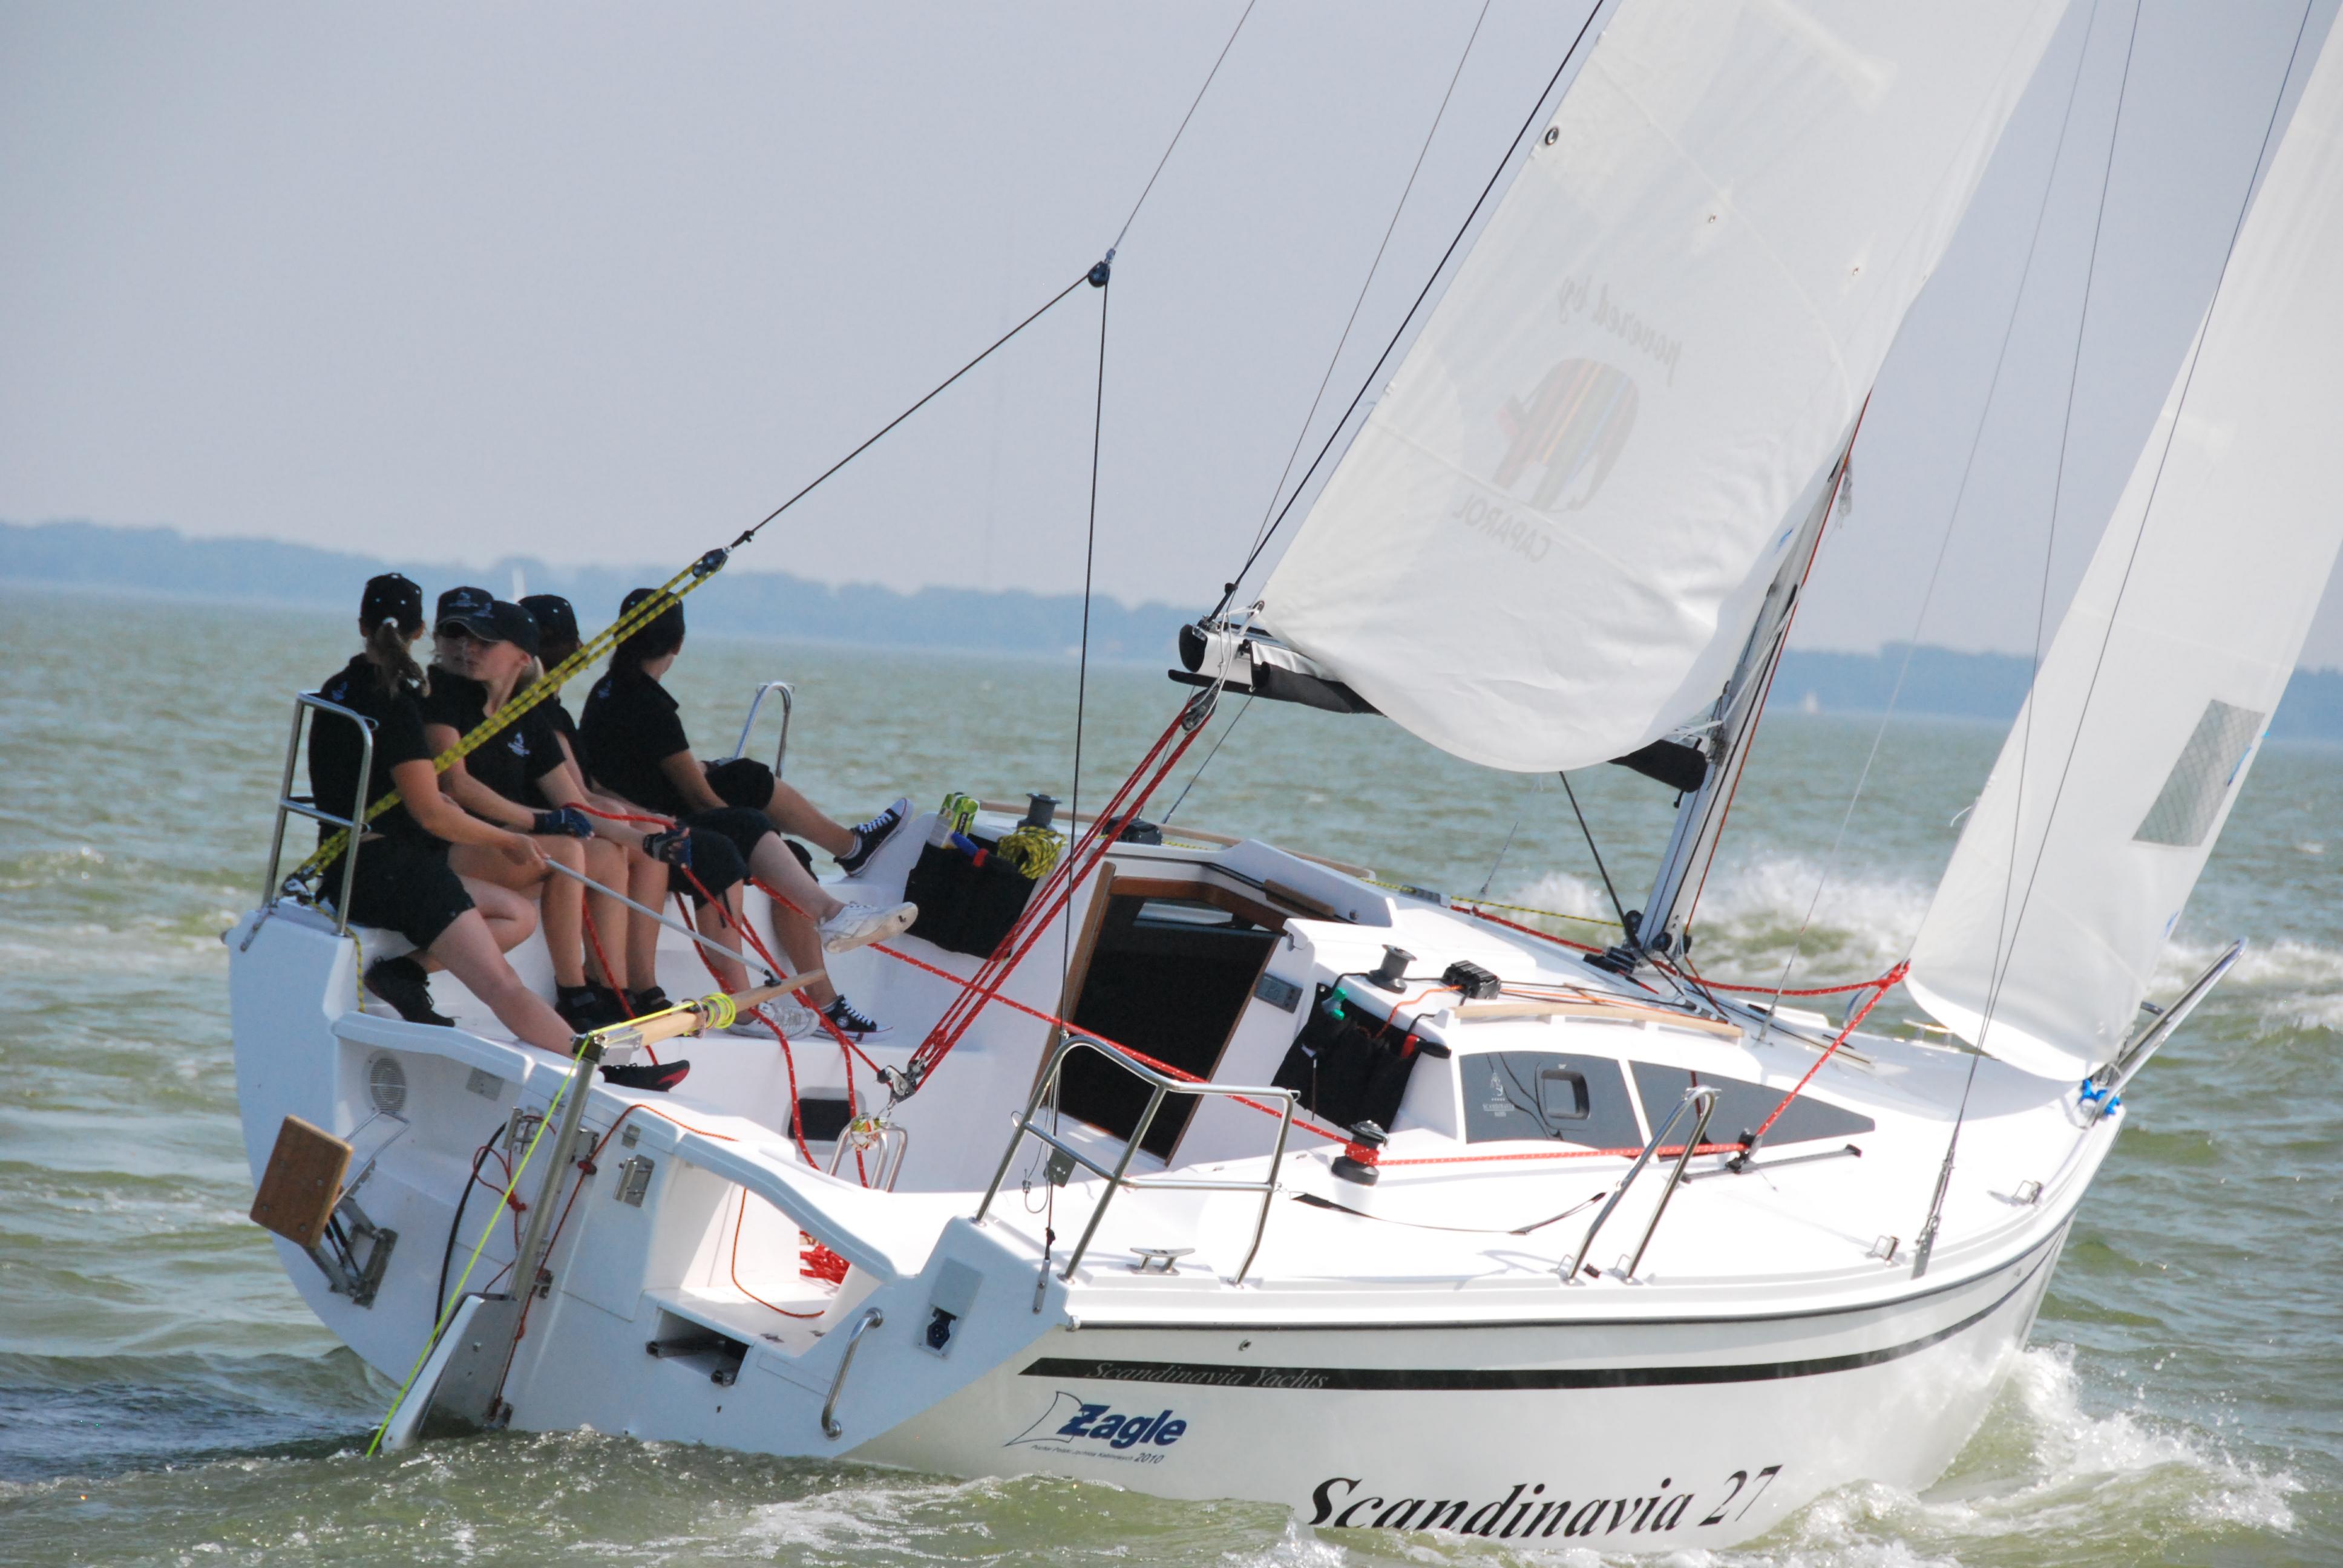 Scandinavia-27-Scandinavia-Yachts-Womens-Sailing-Team-4